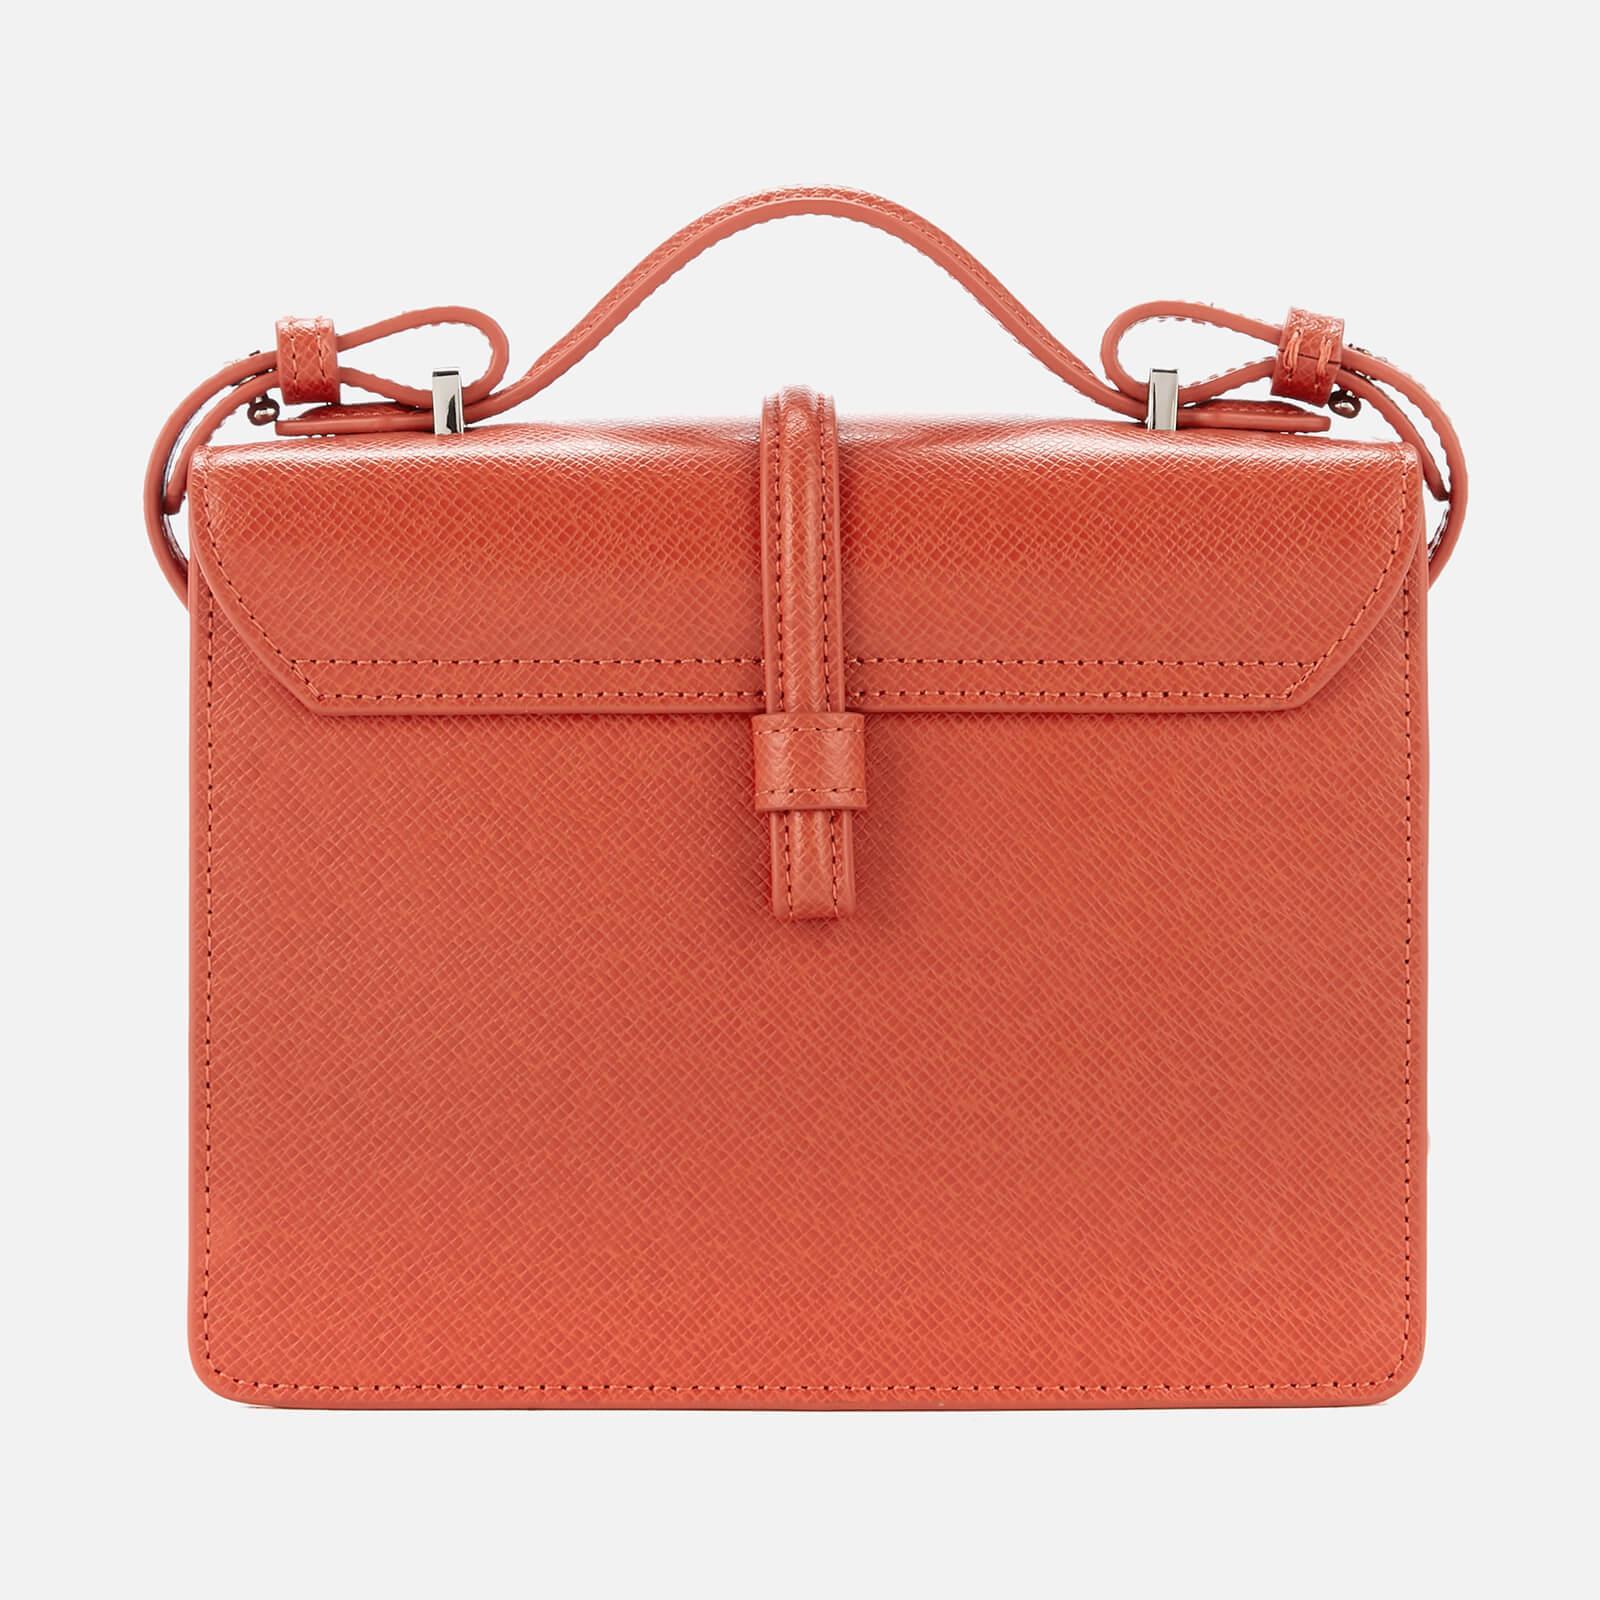 e766d8ccbf Vivienne Westwood - Multicolor Sofia Medium Shoulder Bag - Lyst. View  fullscreen